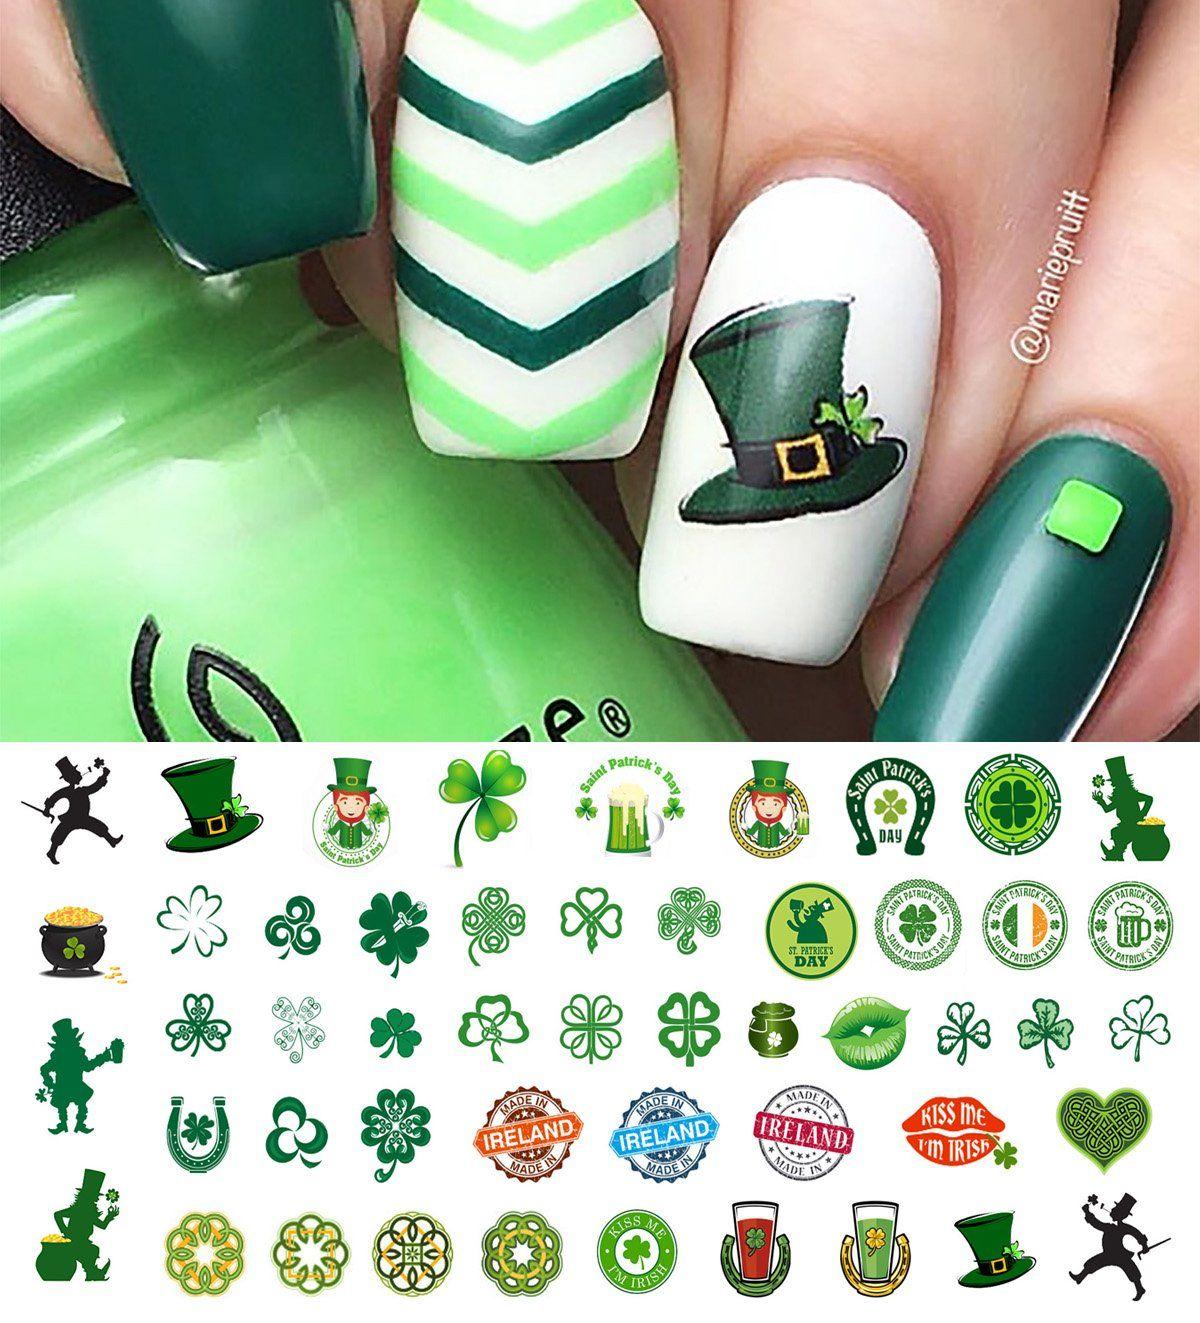 St. Patrick\'s Day Nail Art Decals #2 | Irish nails, Nail decals and ...